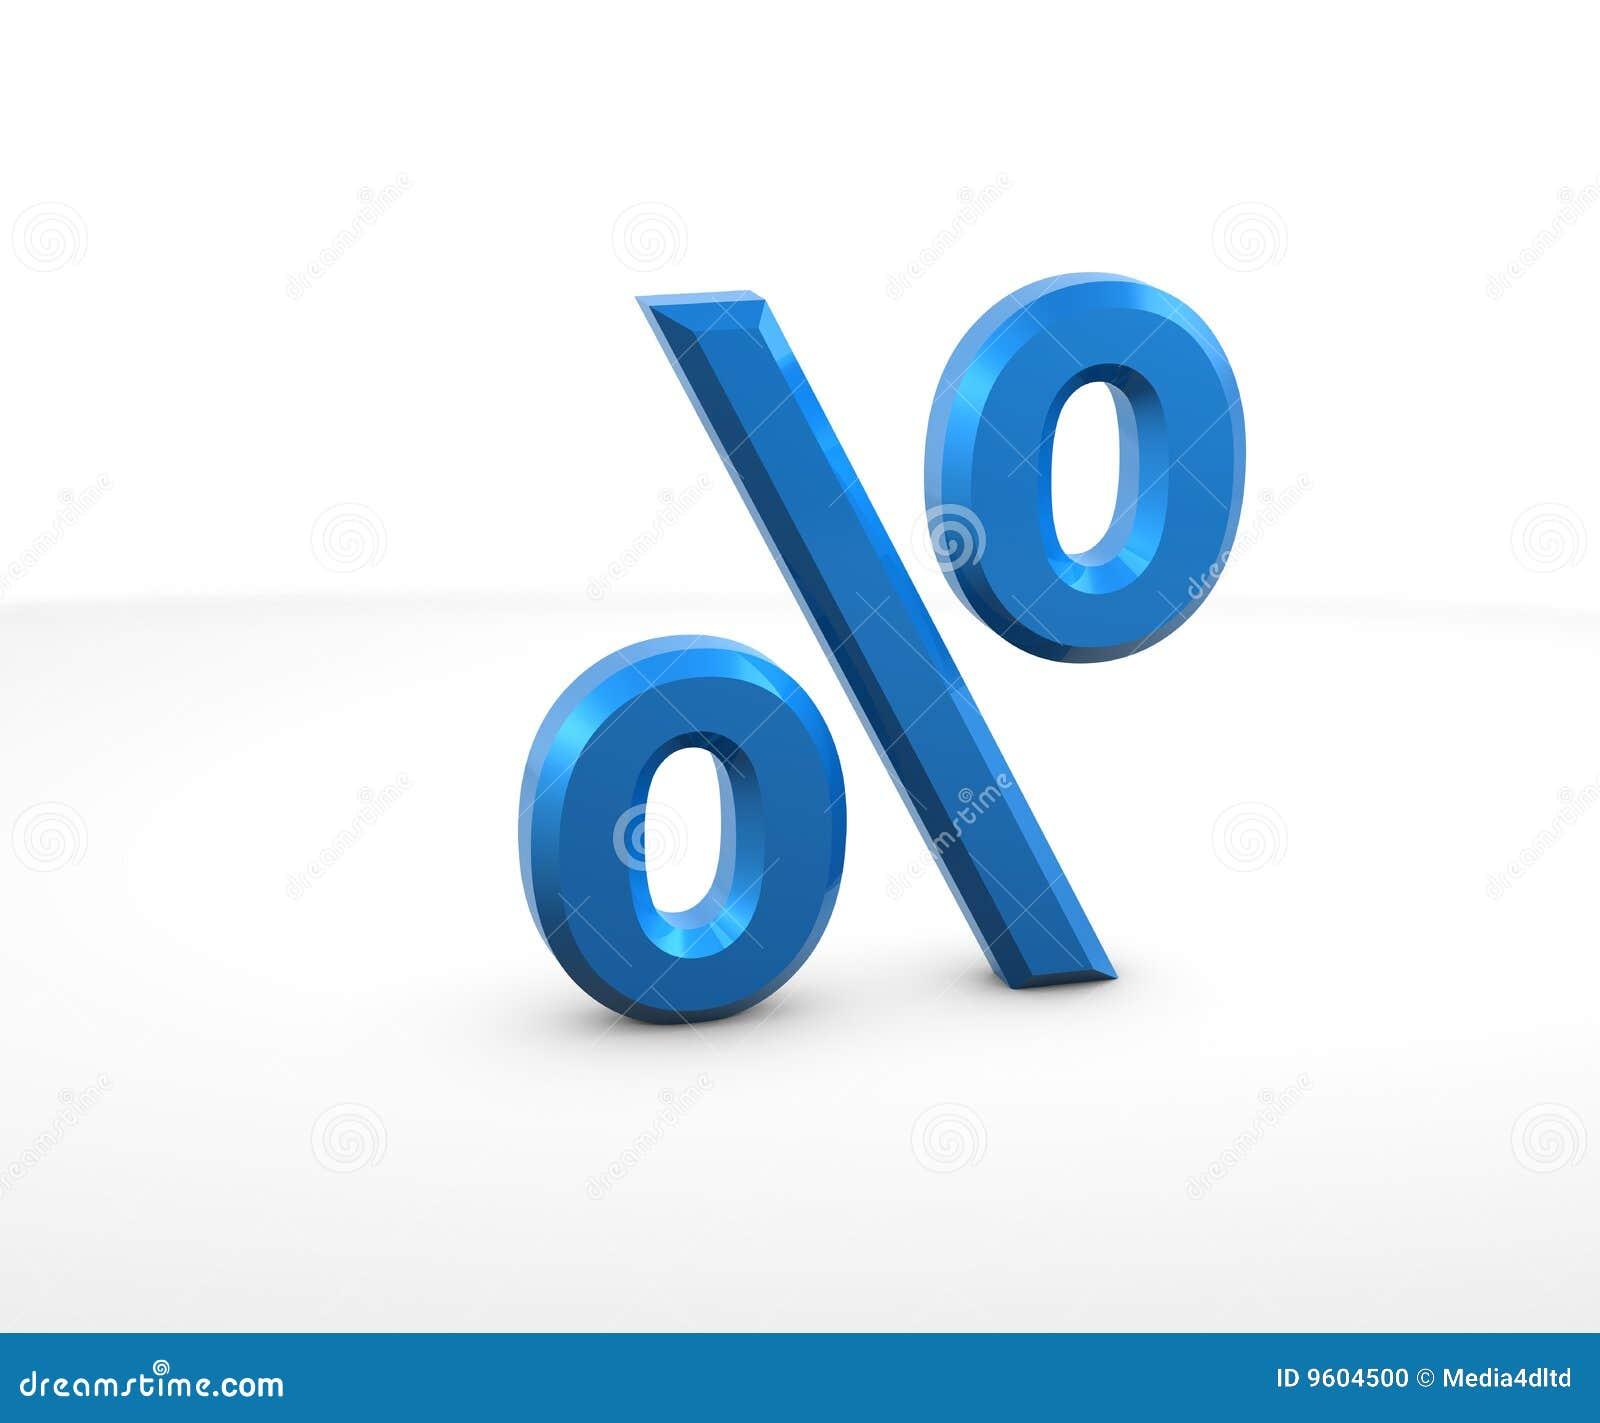 Percentage Sign Stock Photo - Image: 9604500